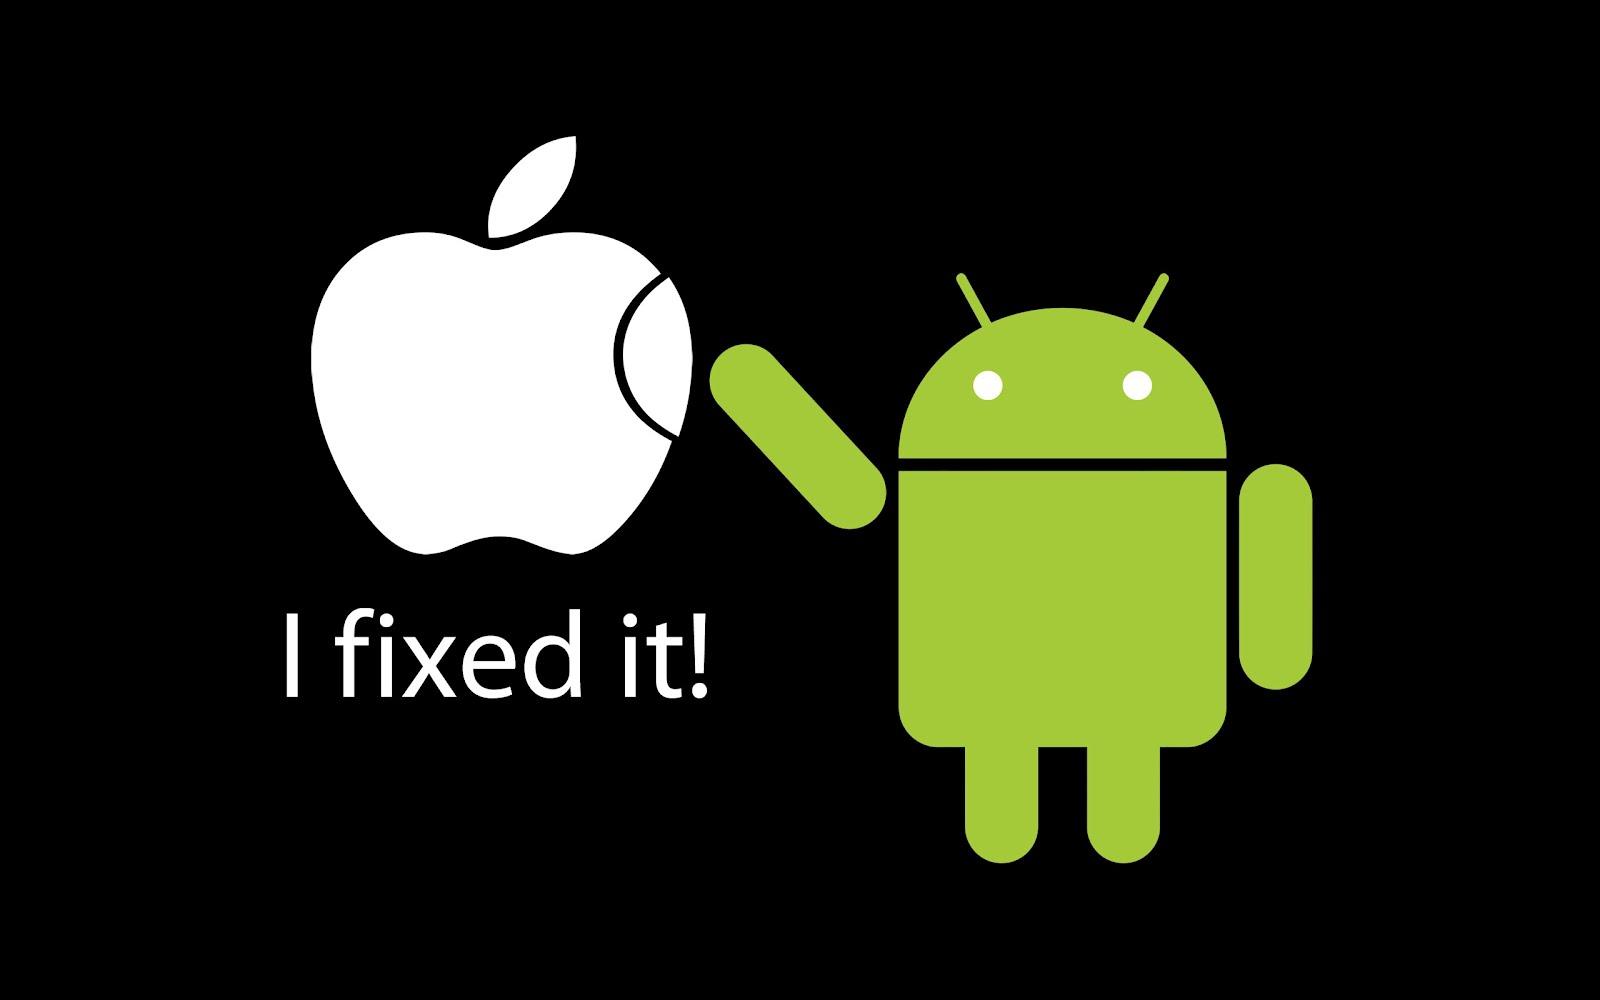 android-apple-wallpaper.jpg